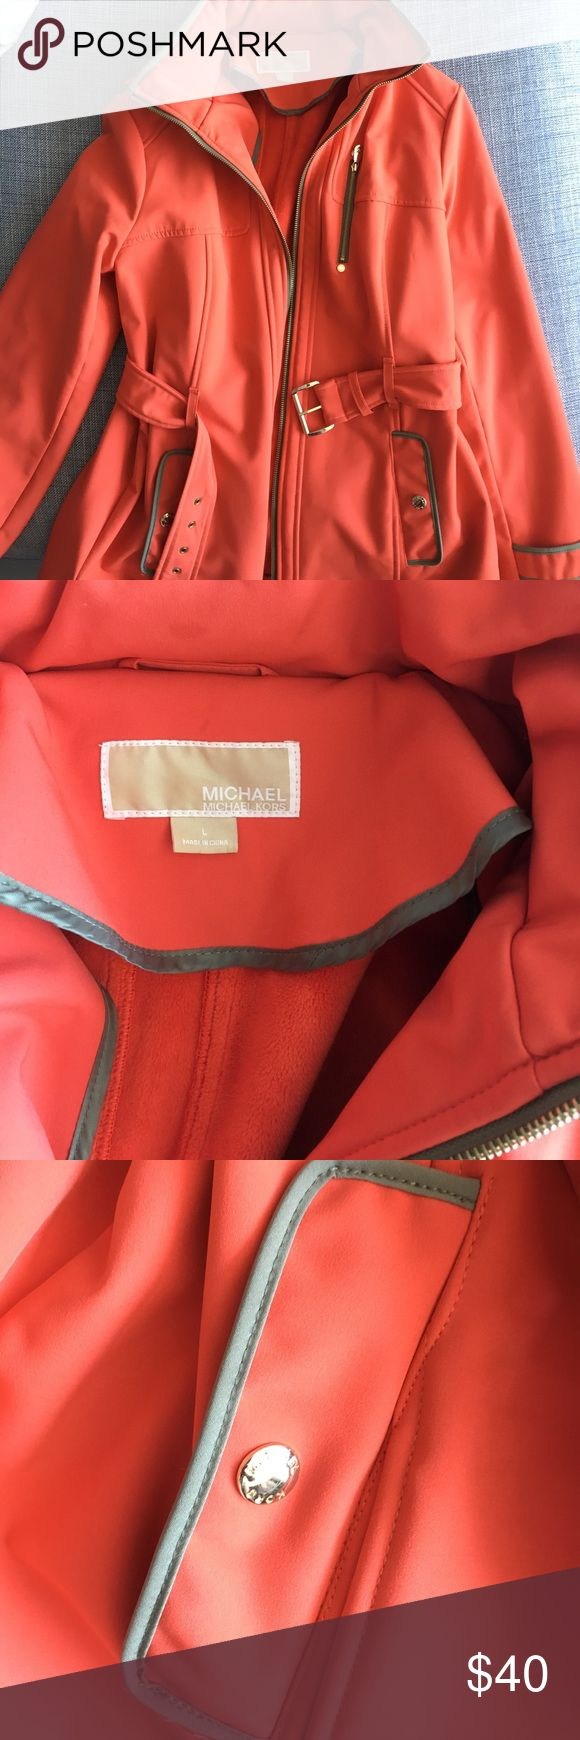 Michael Kors rain jacket with hunter green trim Like new! Worn once MICHAEL Michael Kors Jackets & Coats Trench Coats